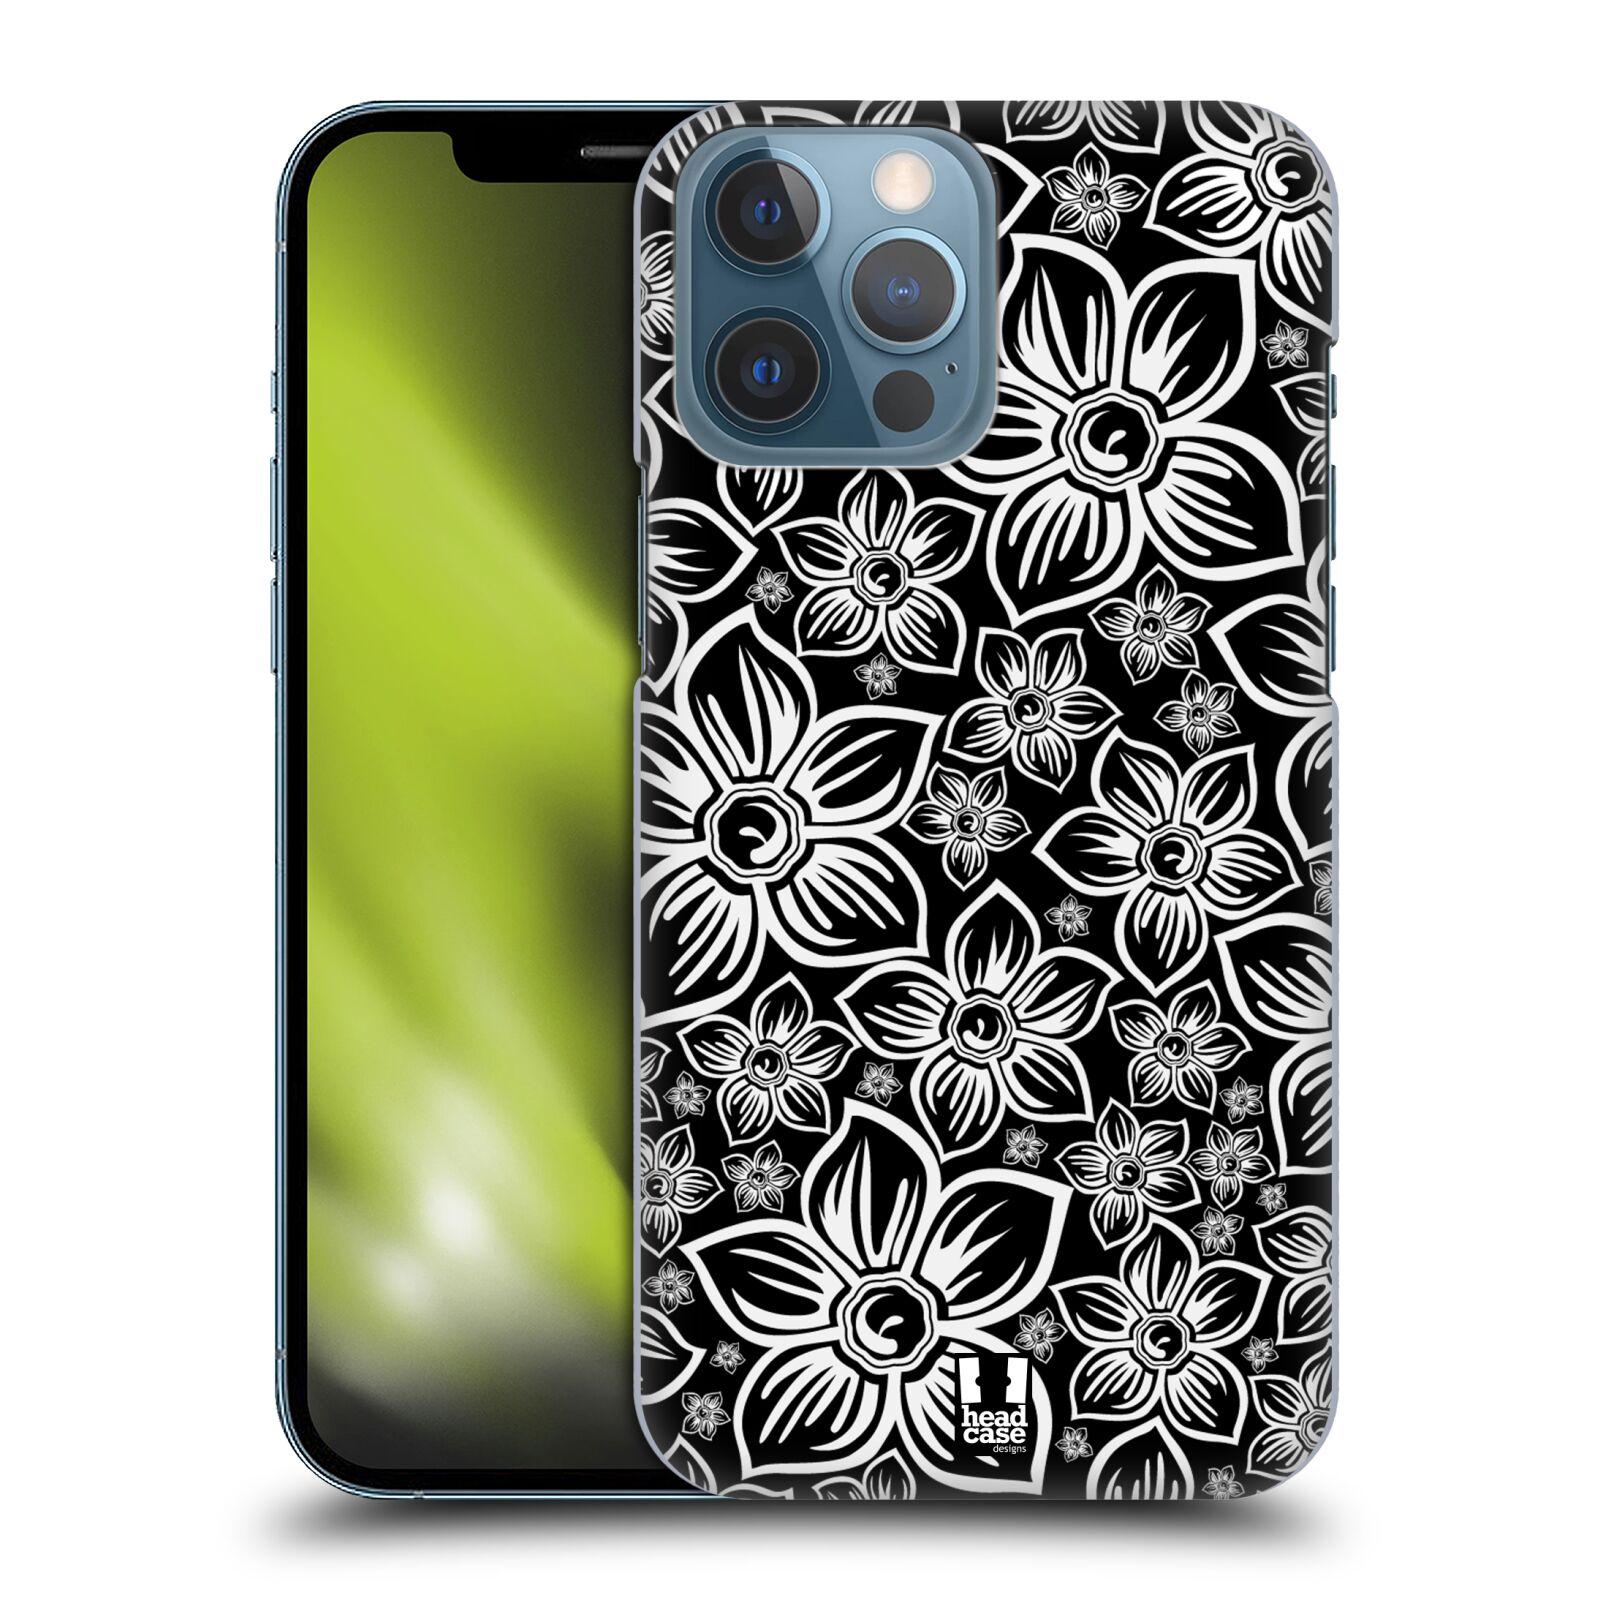 Plastové pouzdro na mobil Apple iPhone 13 Pro Max - Head Case - FLORAL DAISY